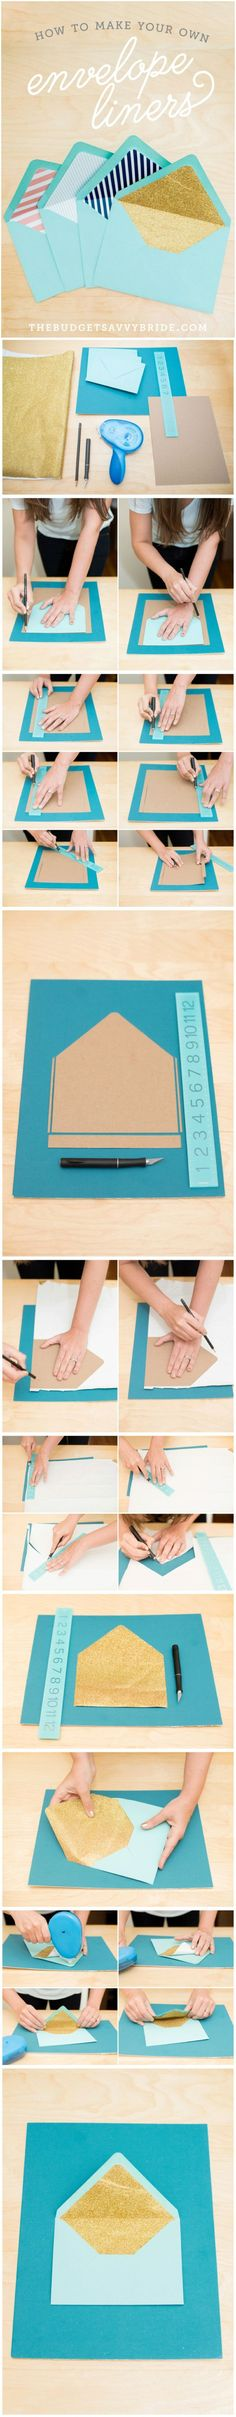 DIY envelope liners   we ❤ this!  moncheribridals.com  #weddinginvitations #DIYweddinginvitations #envelopeliners